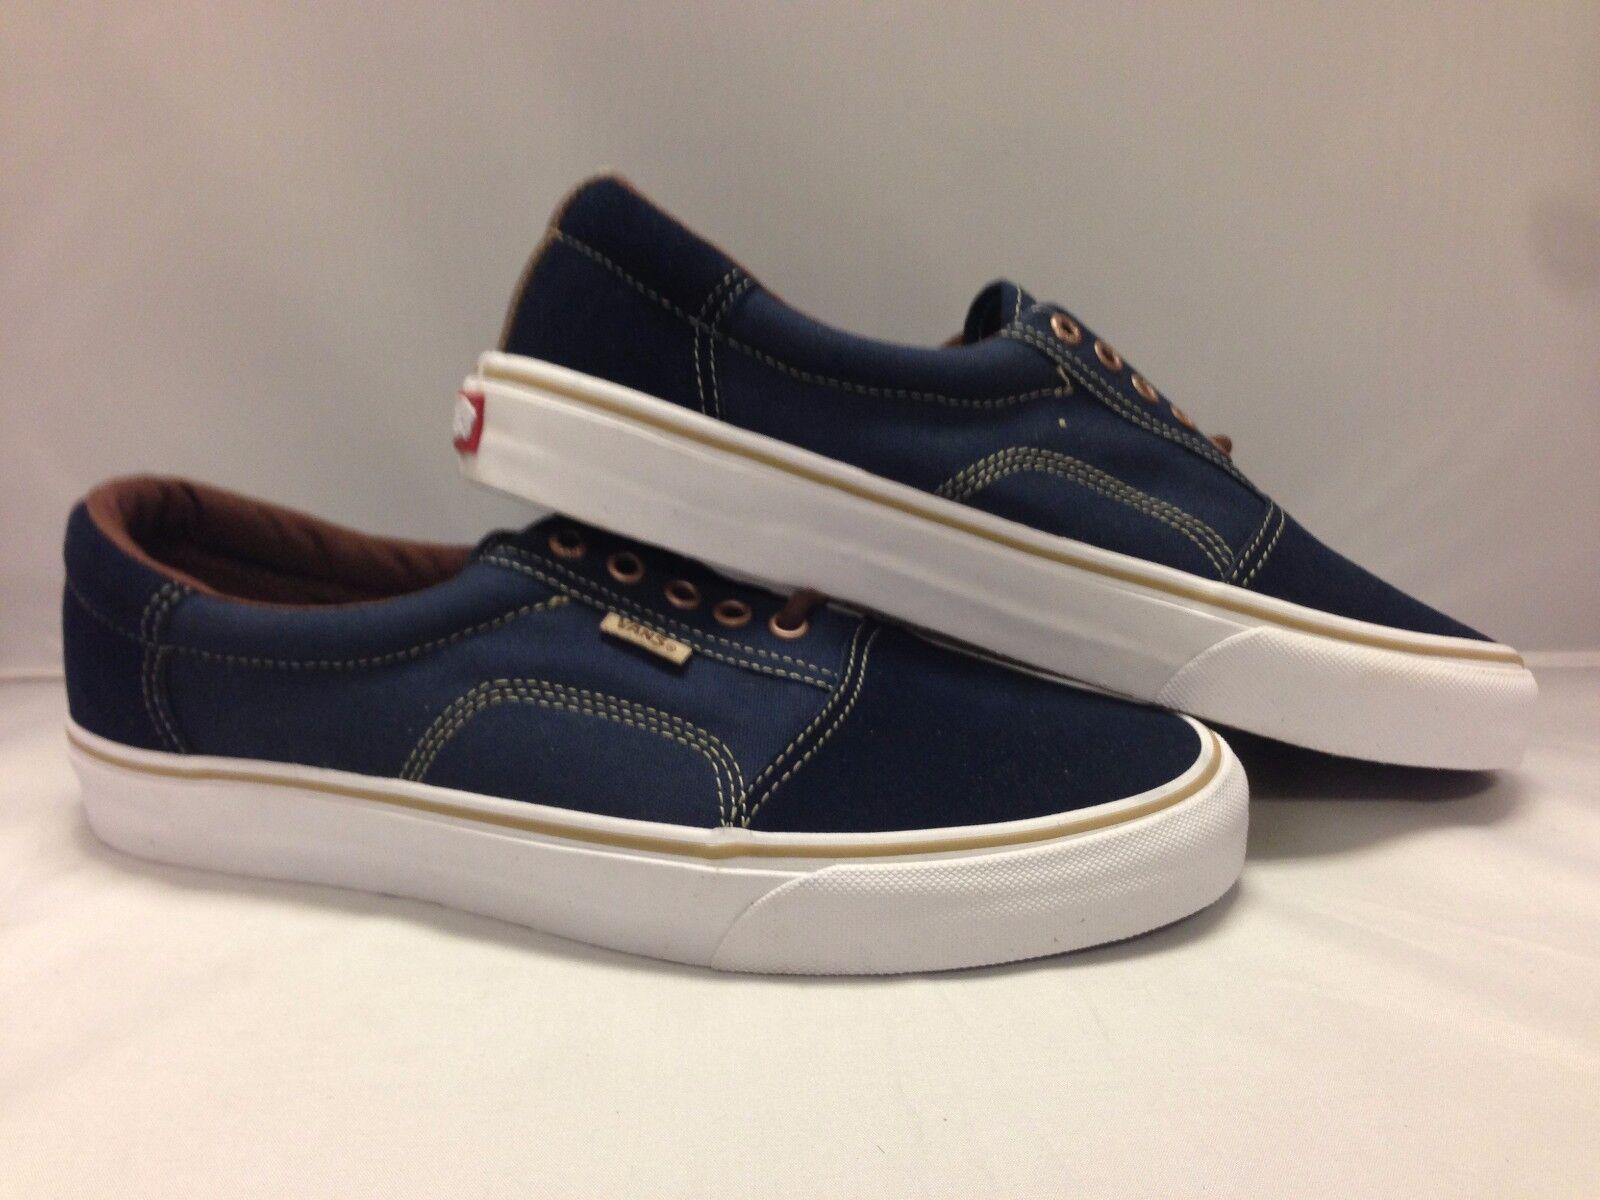 Vans Men's shoes Rowley ''Solos''--Dress bluee Brown